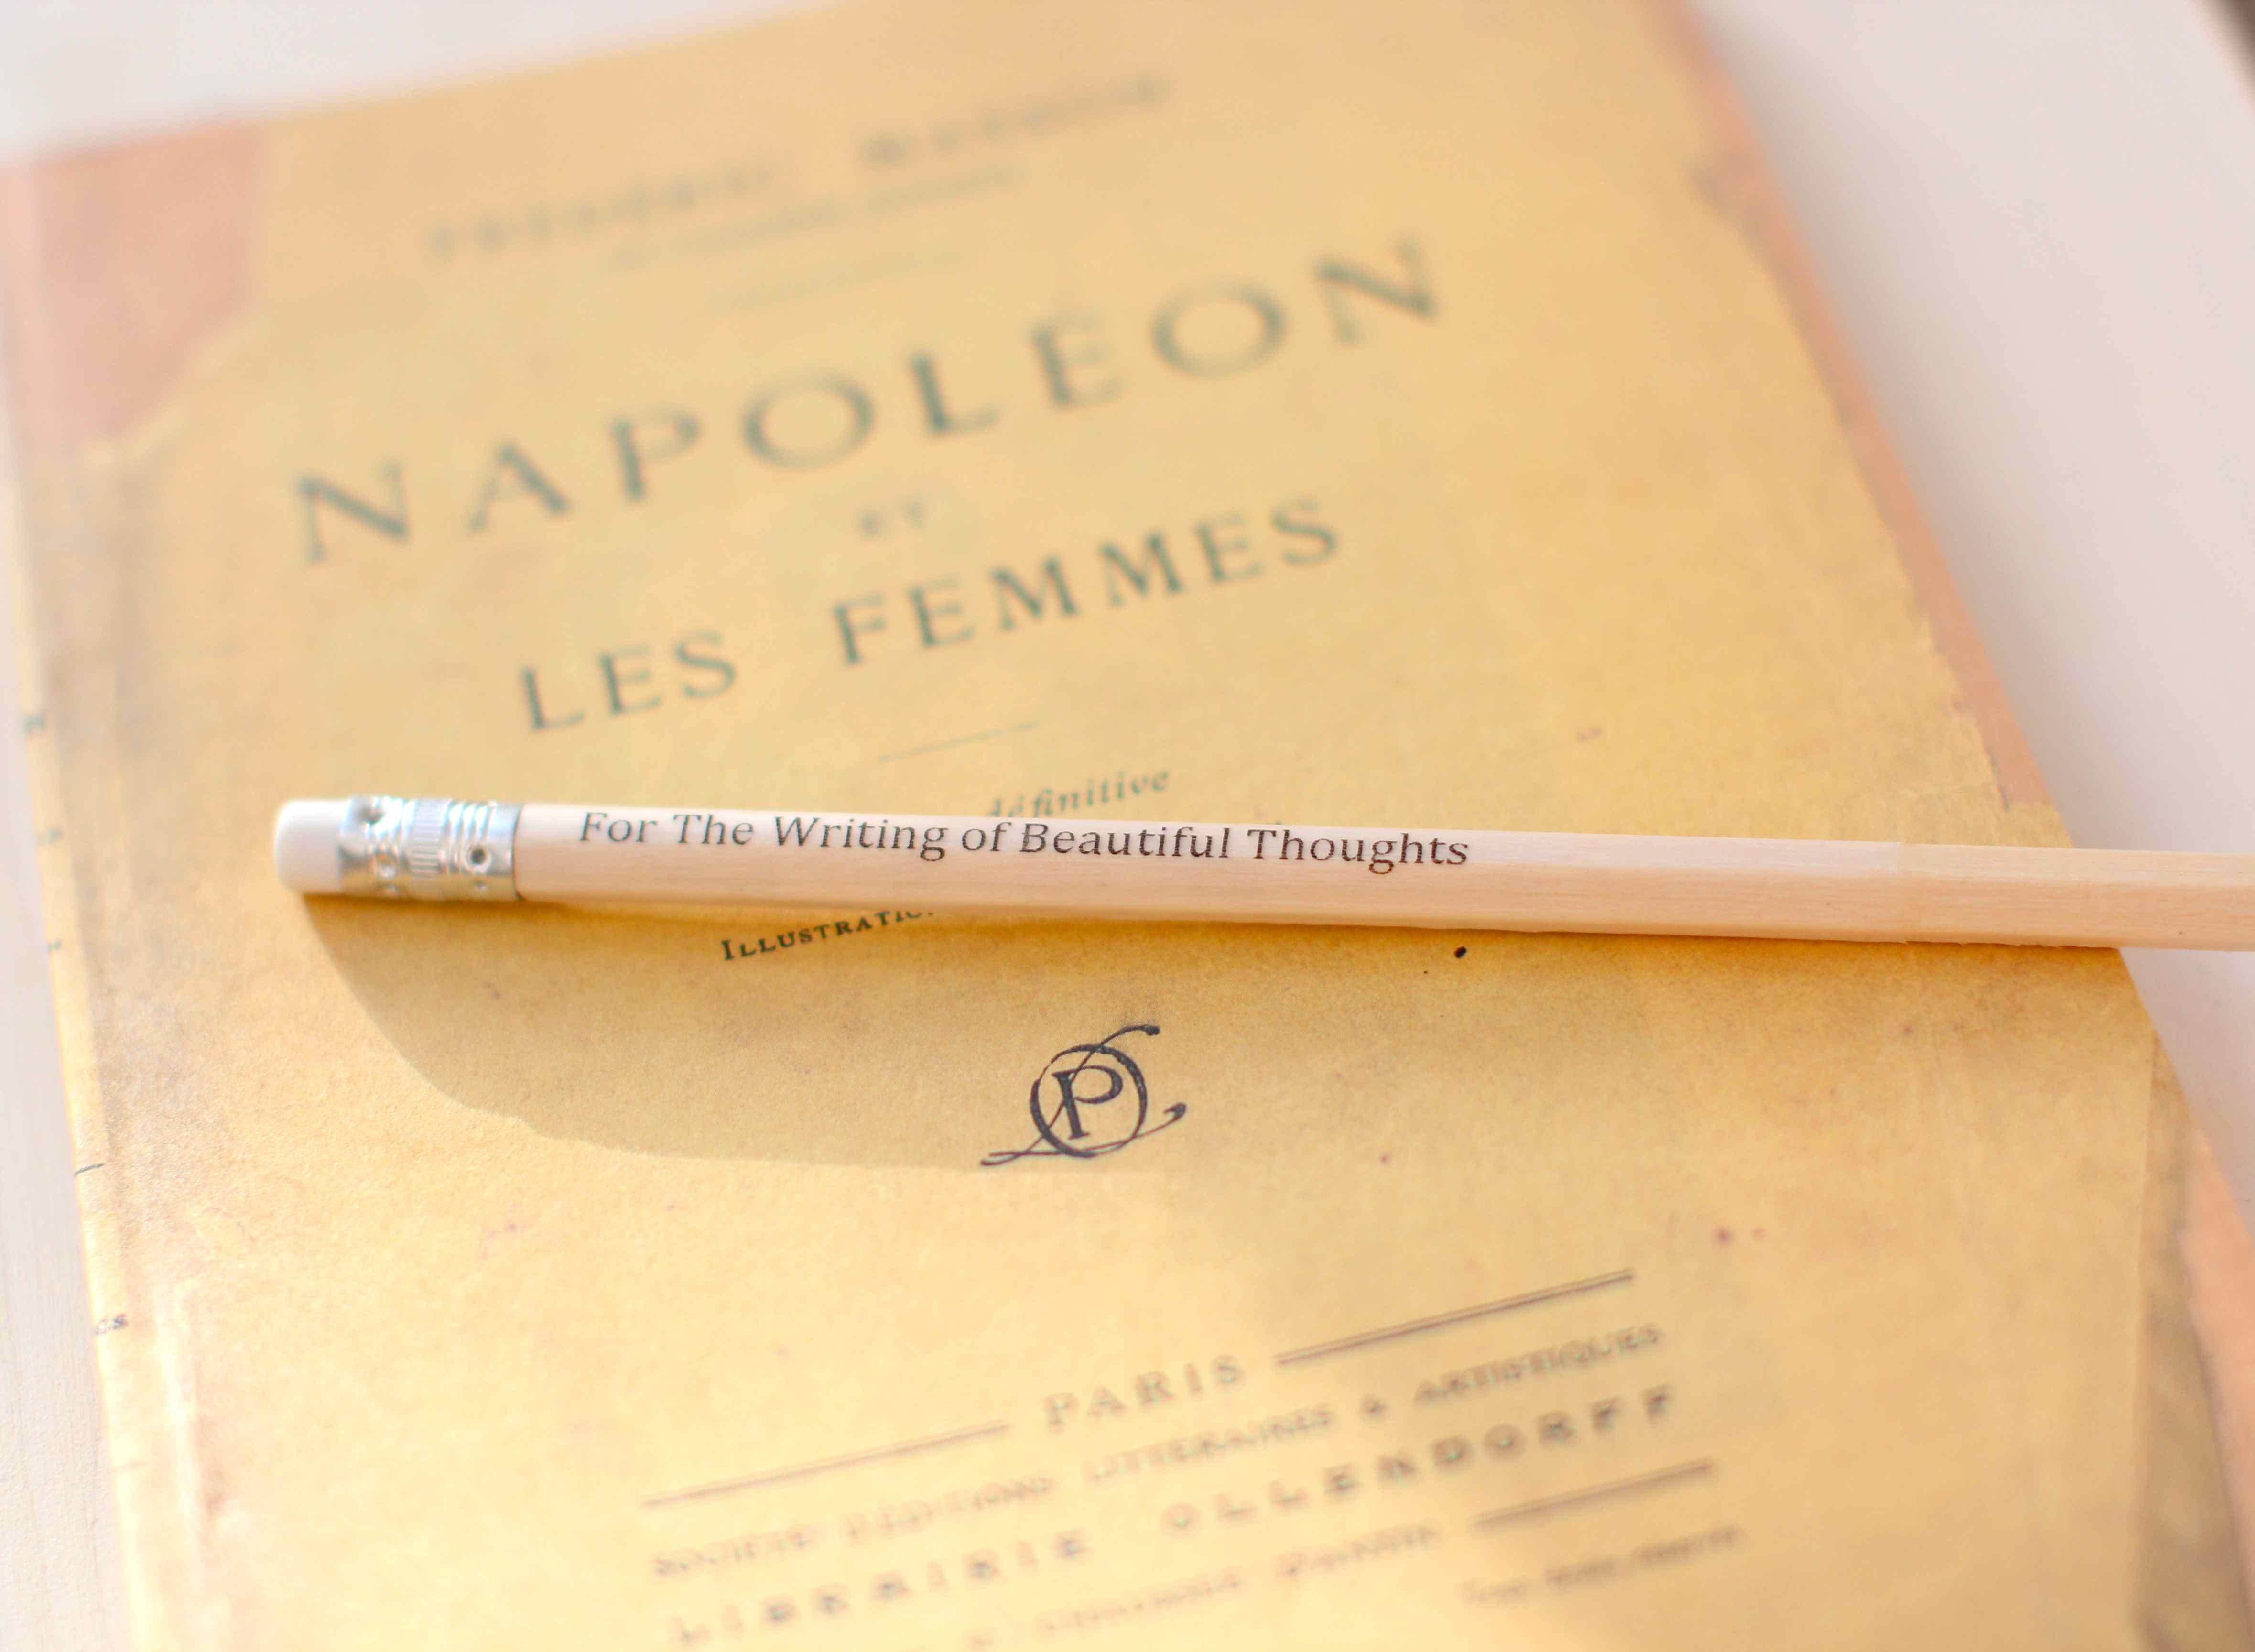 pencil-on-book.jpg